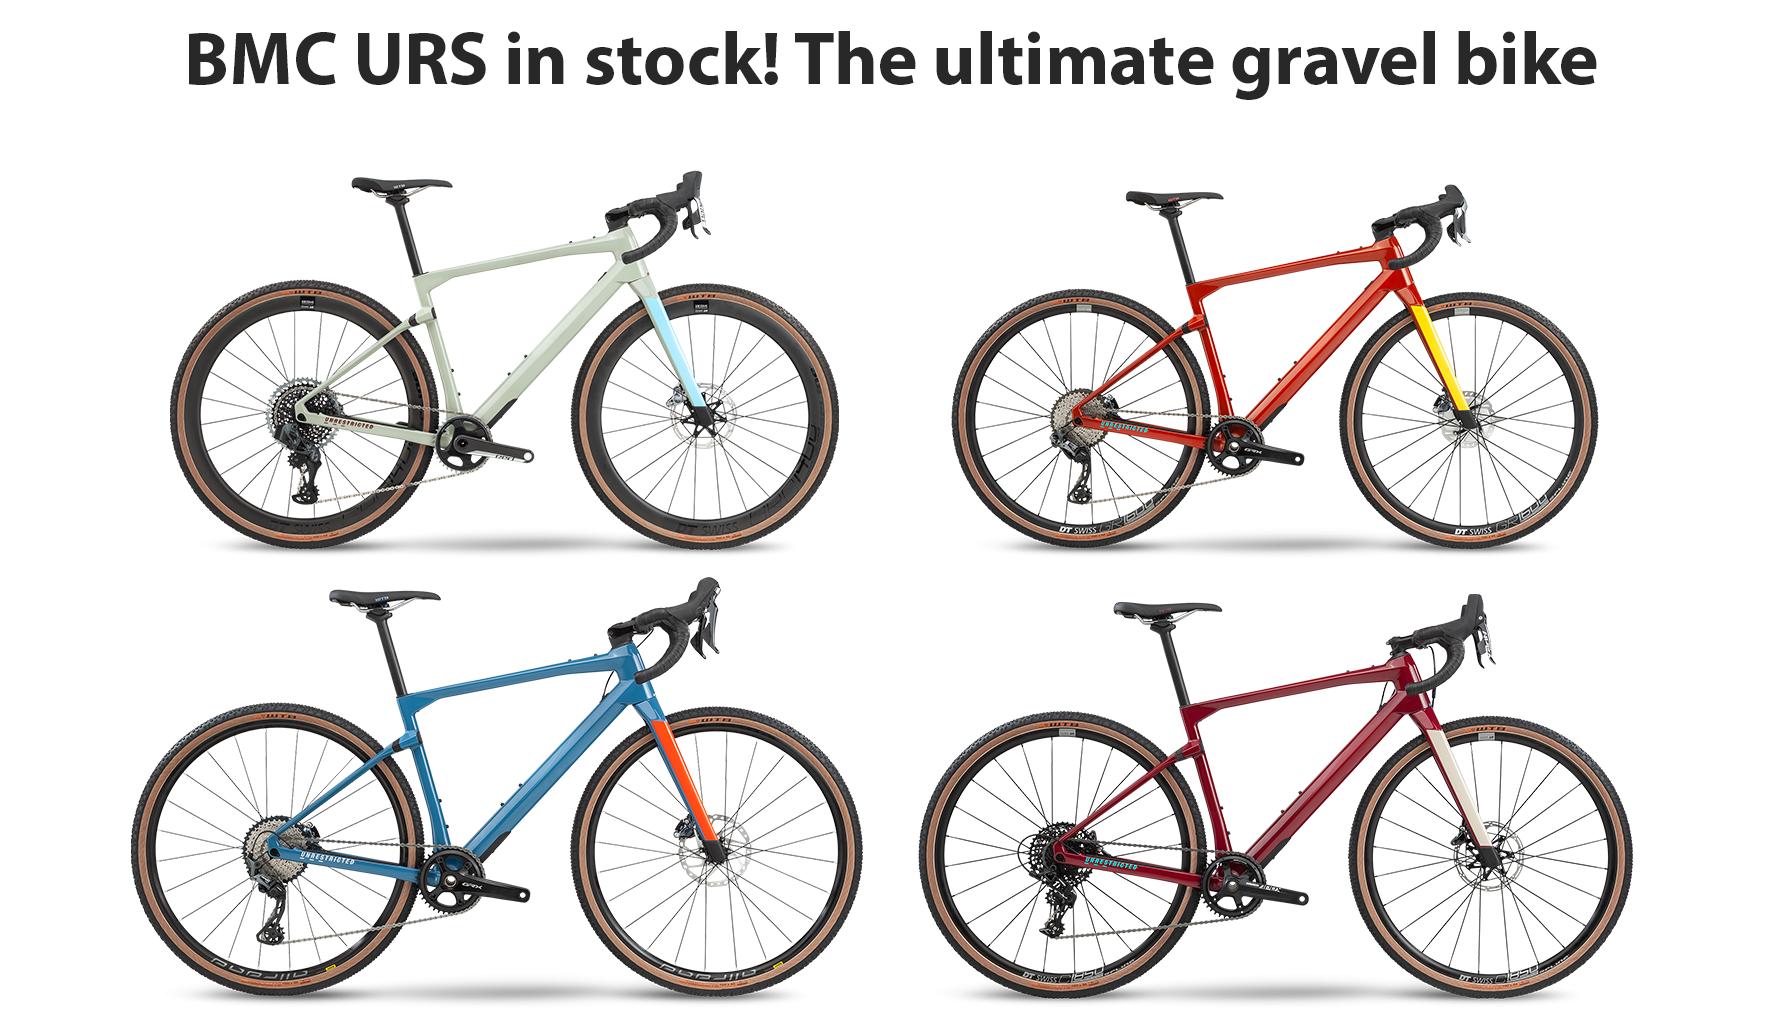 BMC URS in stock! The ultimate gravel bike